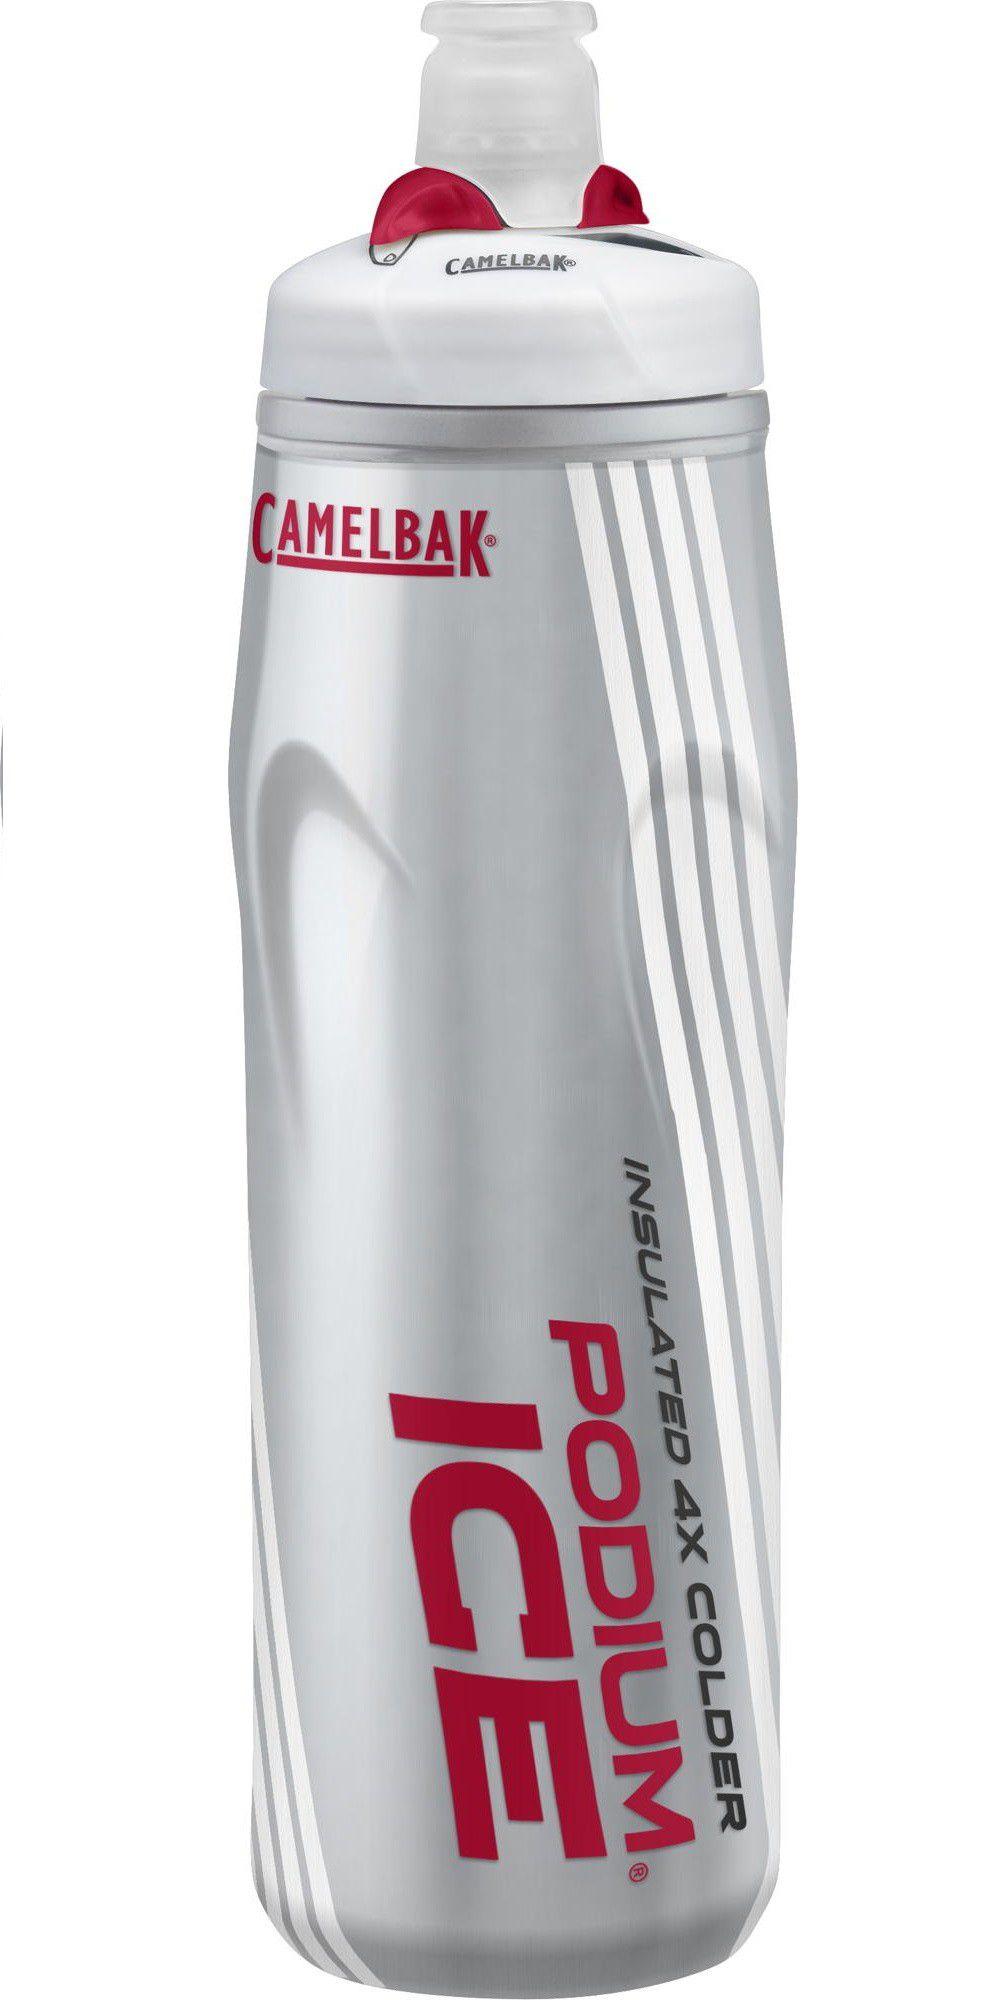 Garrafa Squeeze Camelbak Podium Ice 4x Mais Térmica 620 Ml Cinza/Vermelha